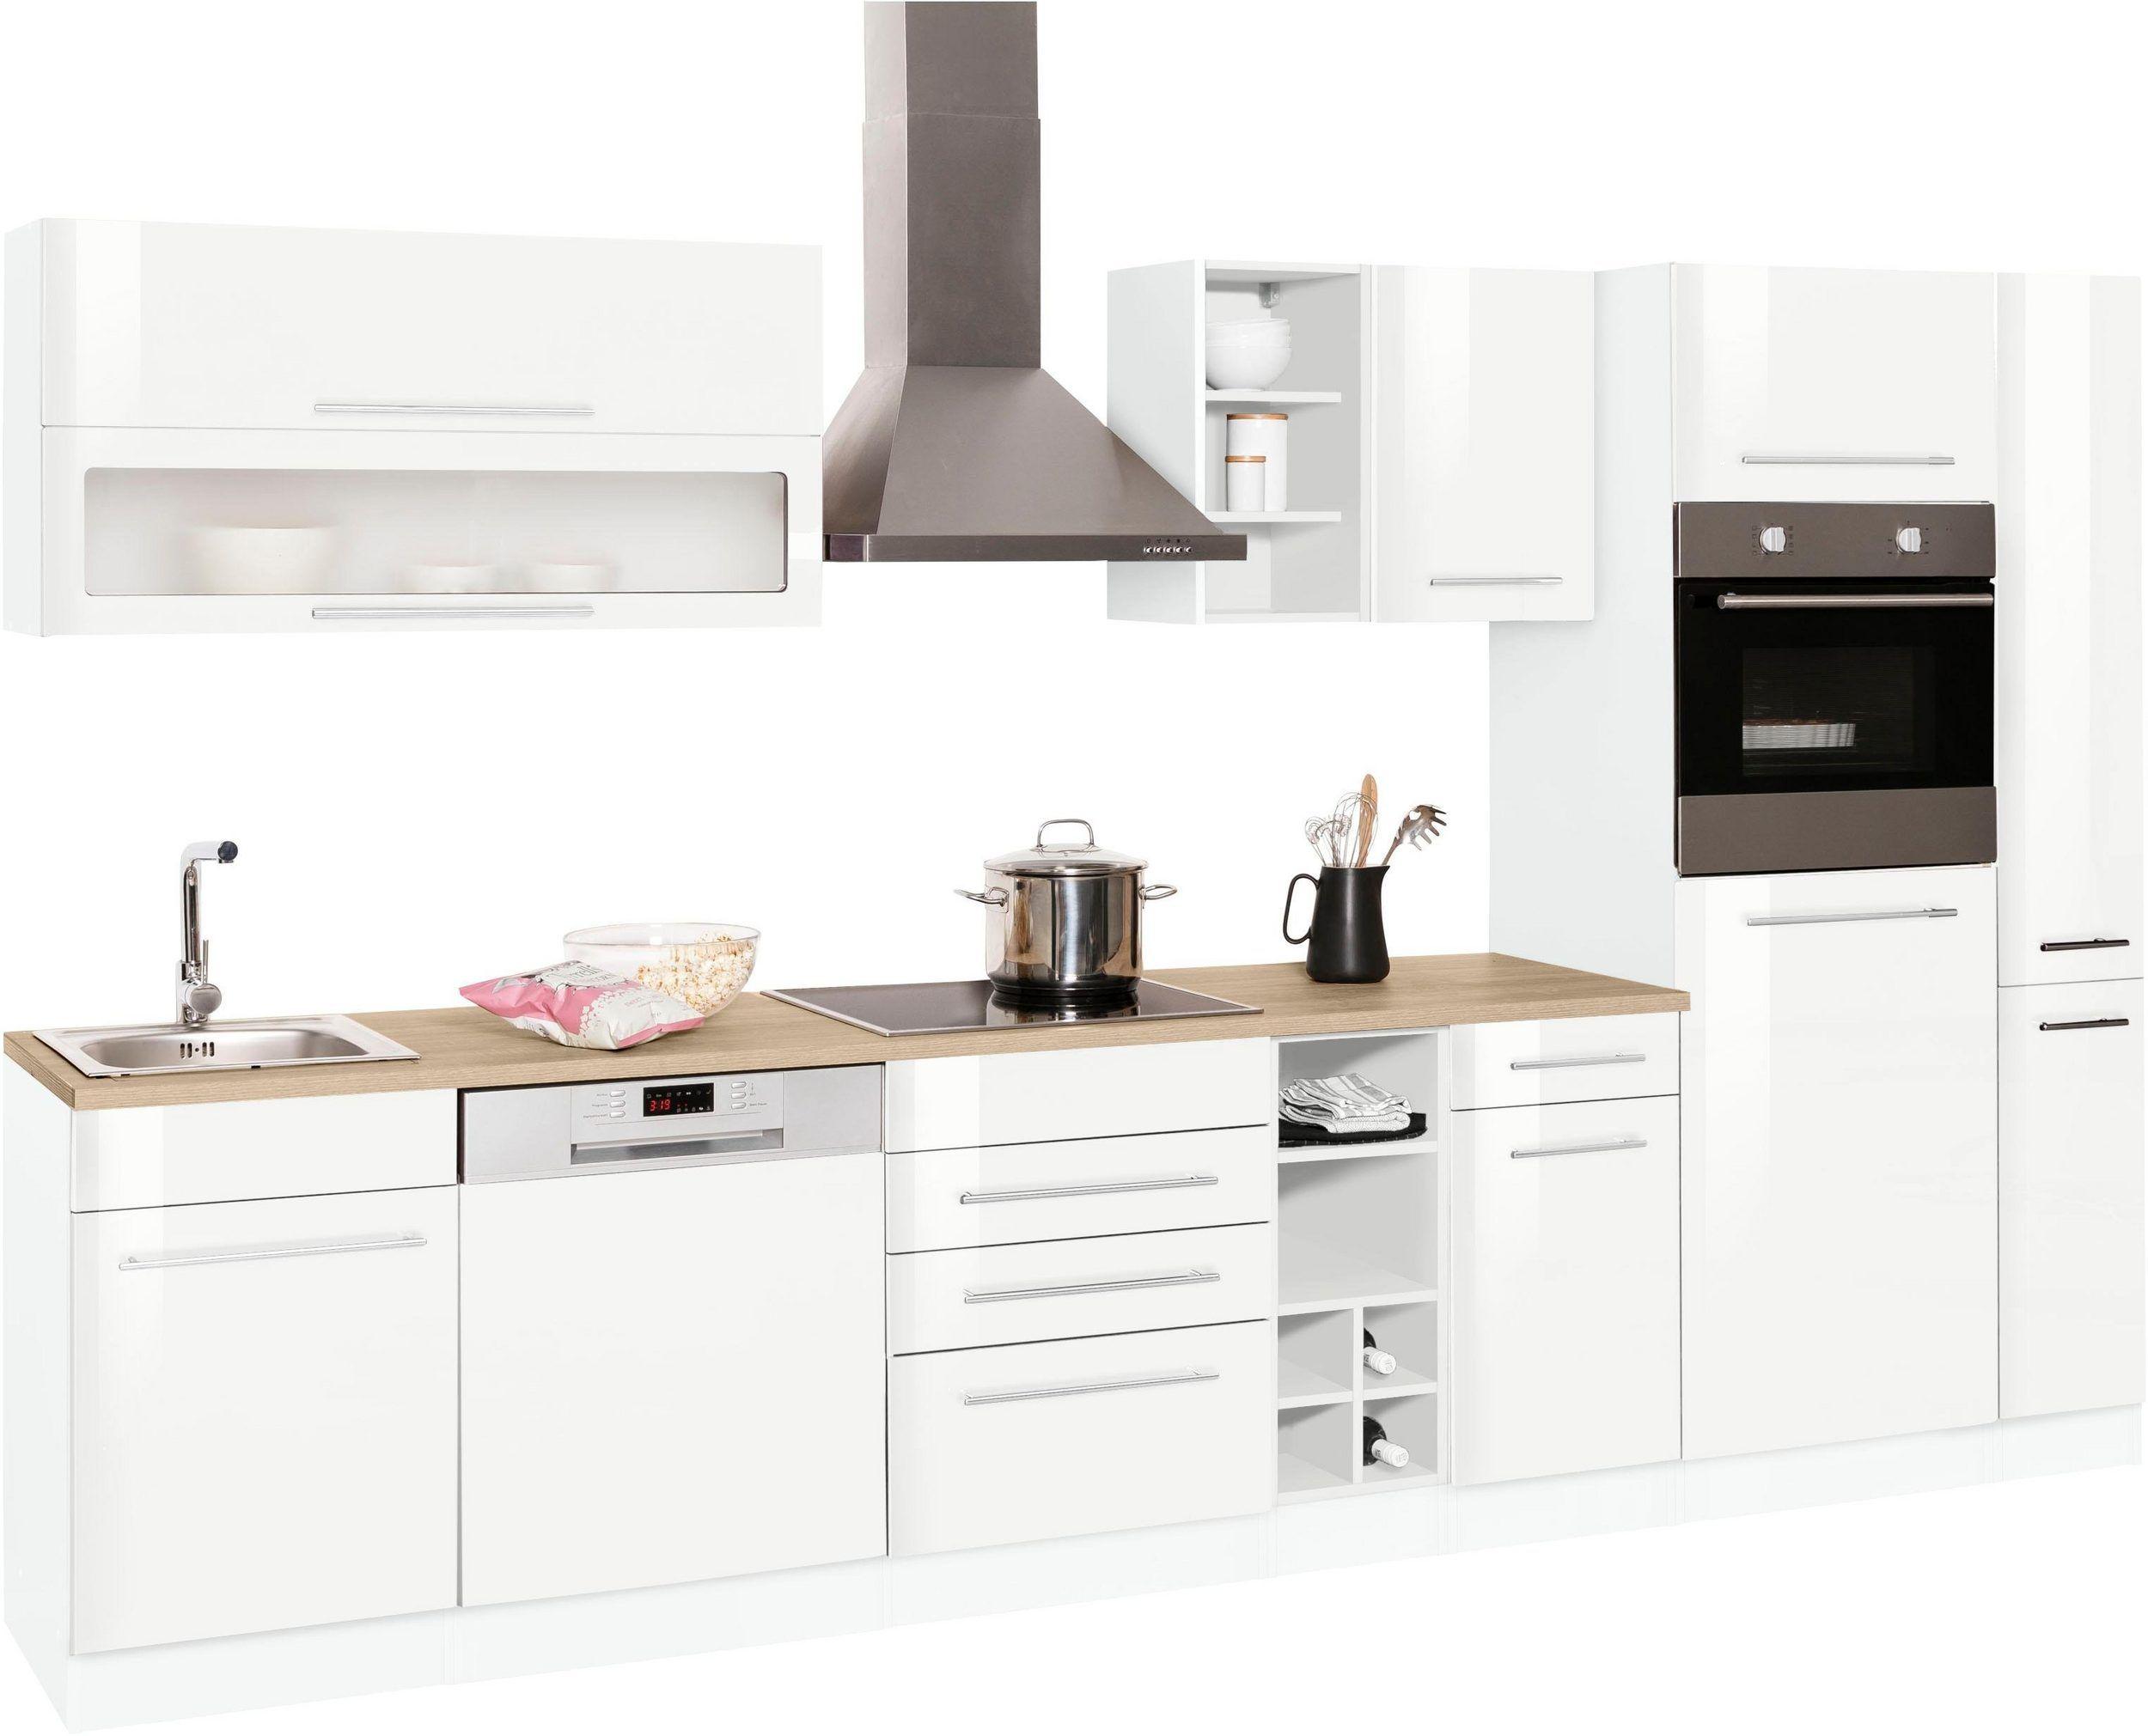 Held Mobel Held Kitchen Cabinets Kitchen Cabinets Kitchen Units Kitchen Cabinets Models